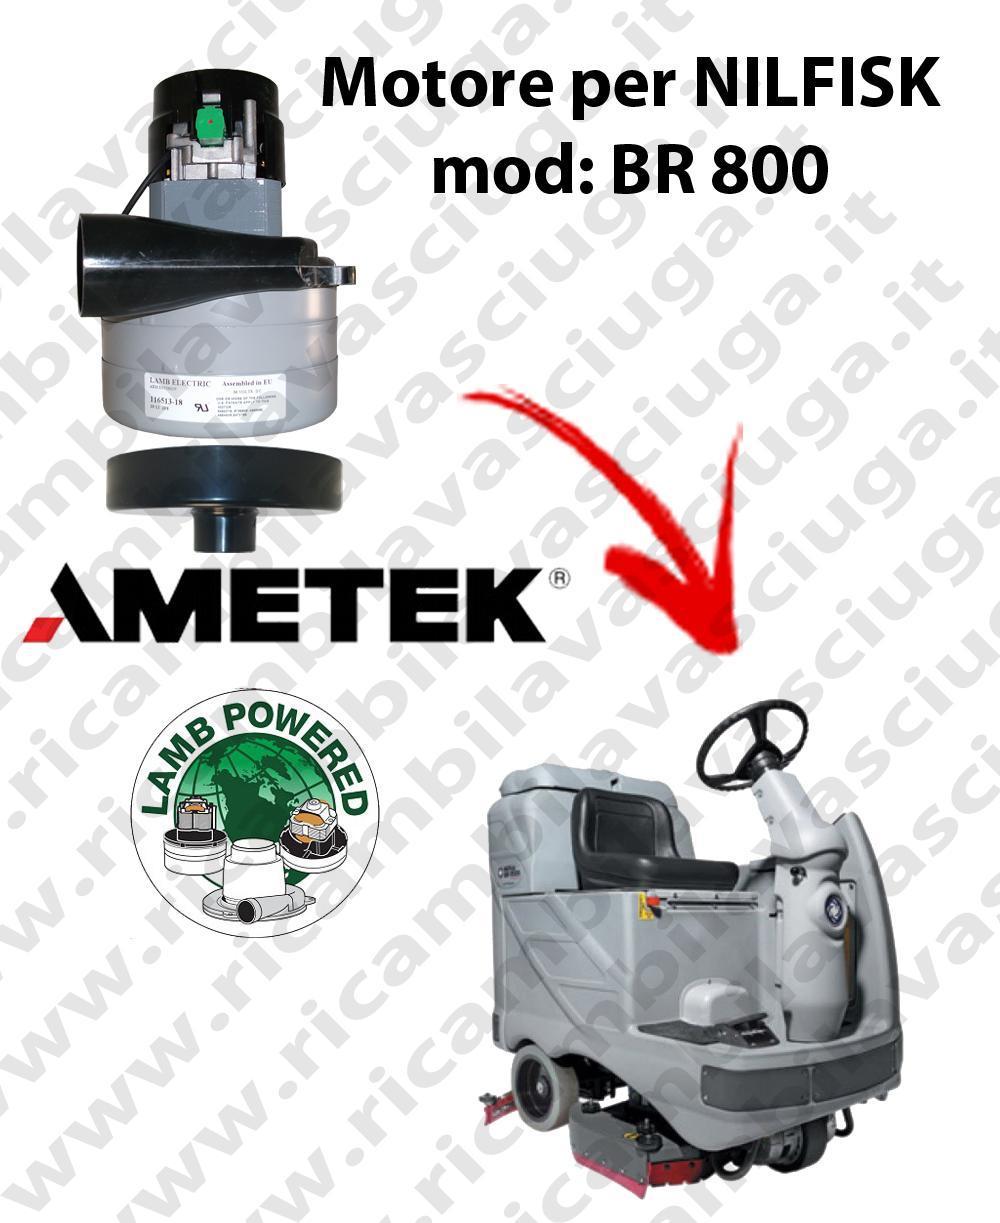 BR 800 Saugmotor LAMB AMETEK für scheuersaugmaschinen NILFISK